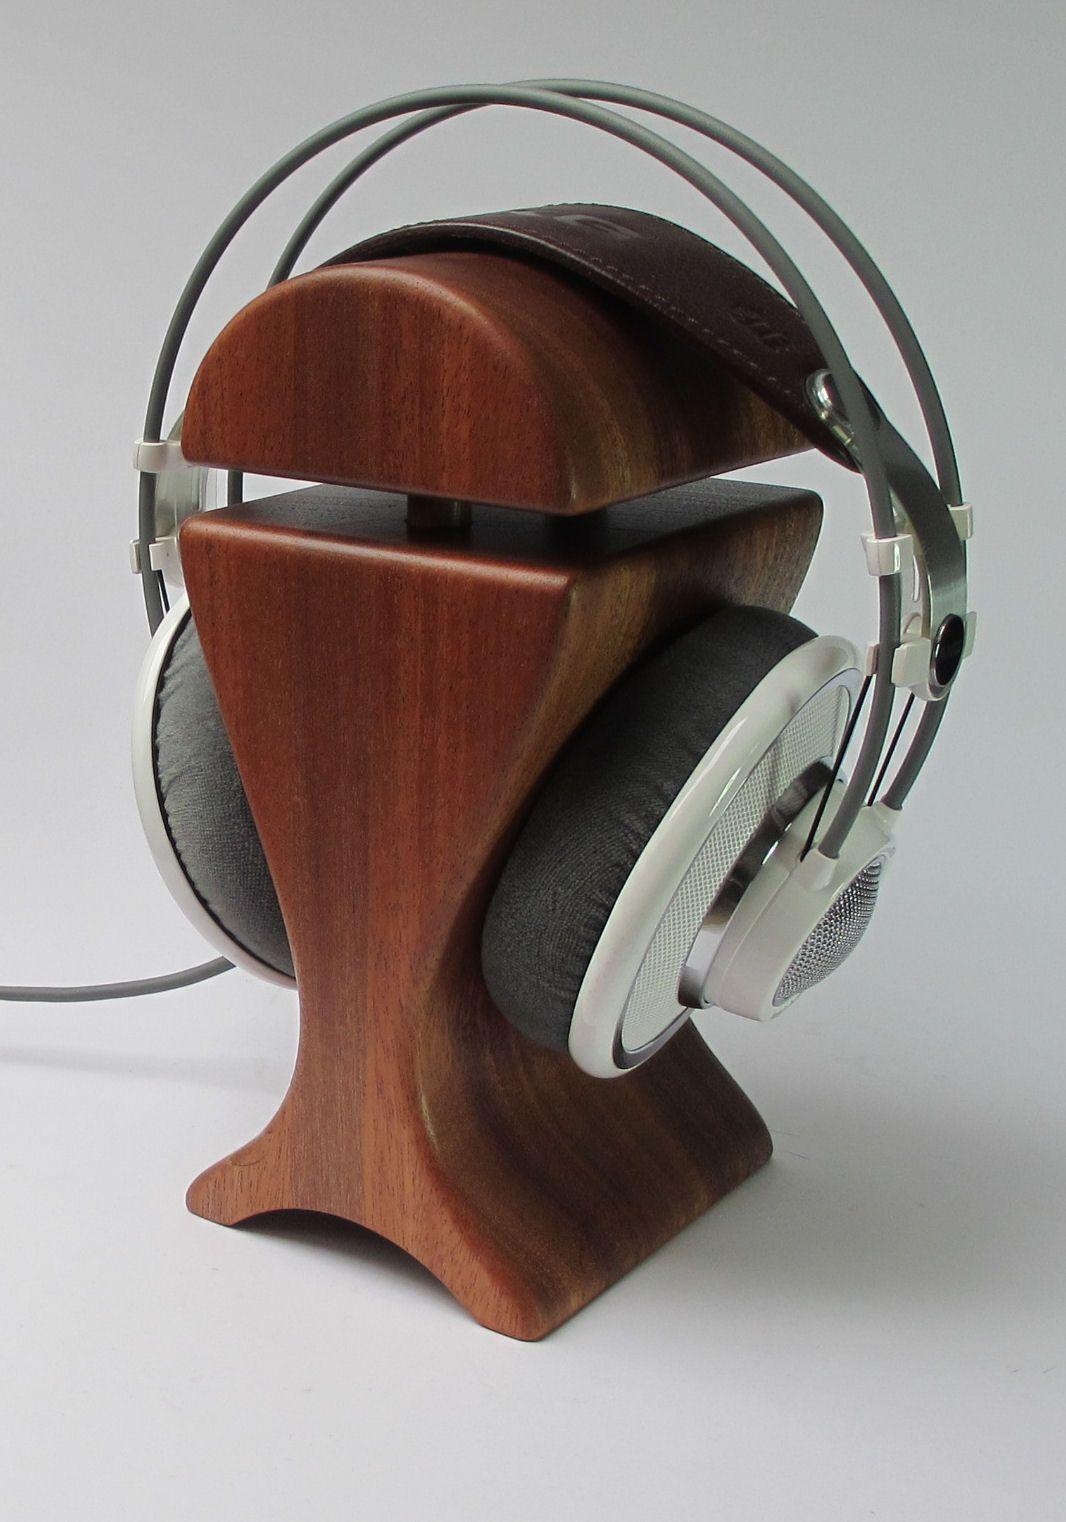 Very Inspirational DIY Headphone Stand Ideas diy headphone ...